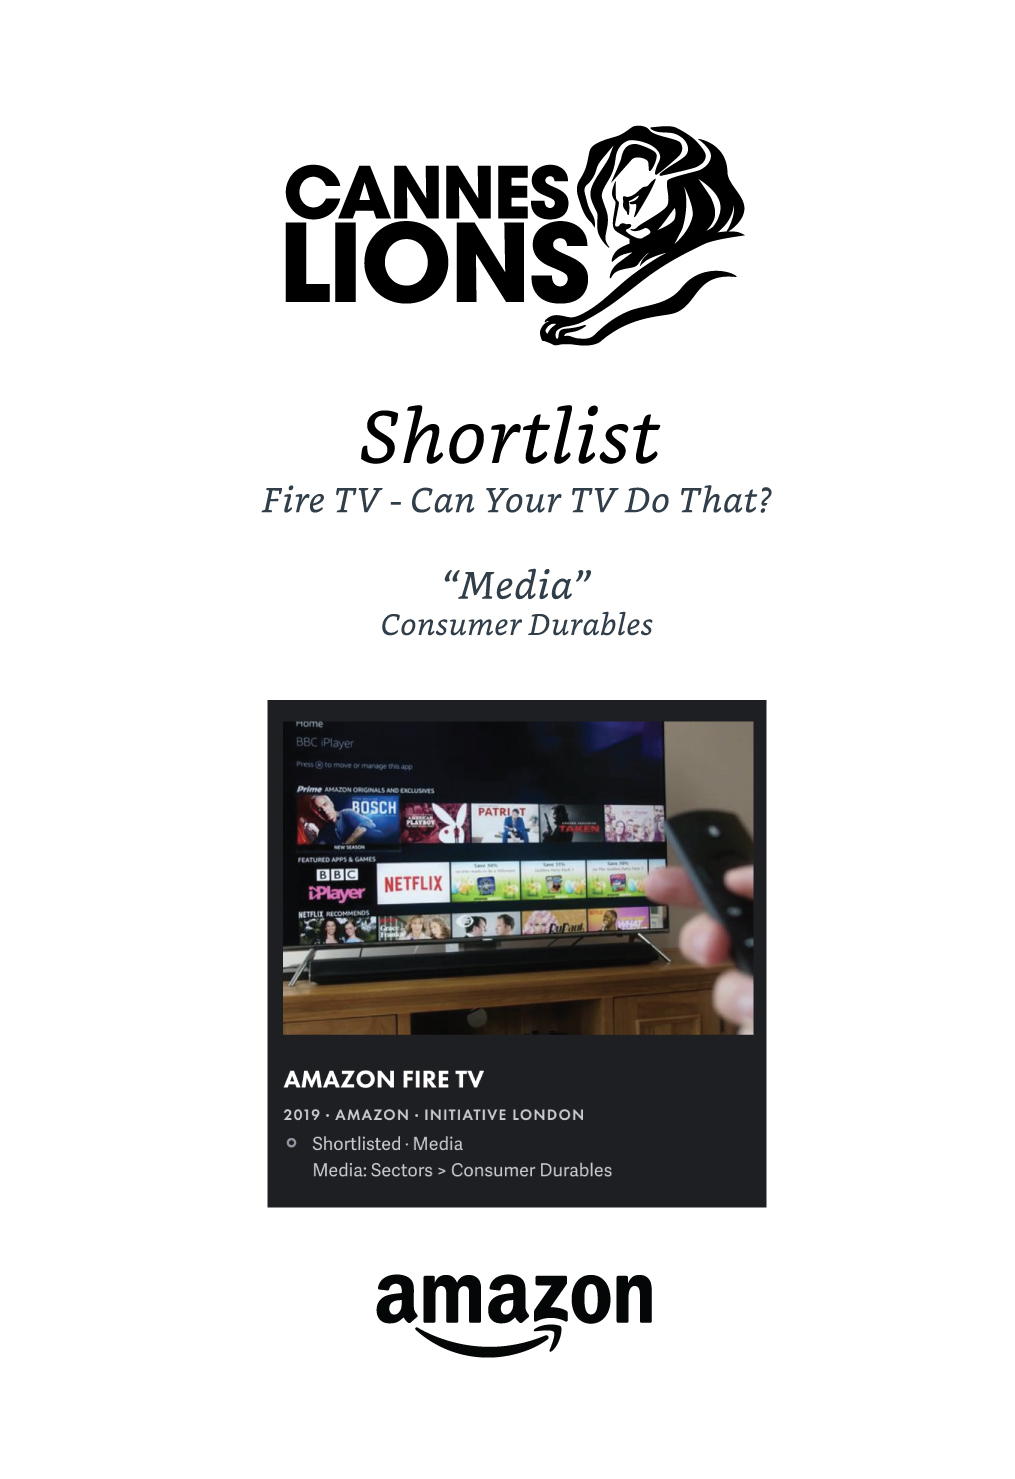 FireTV-shortlist-2019.jpg